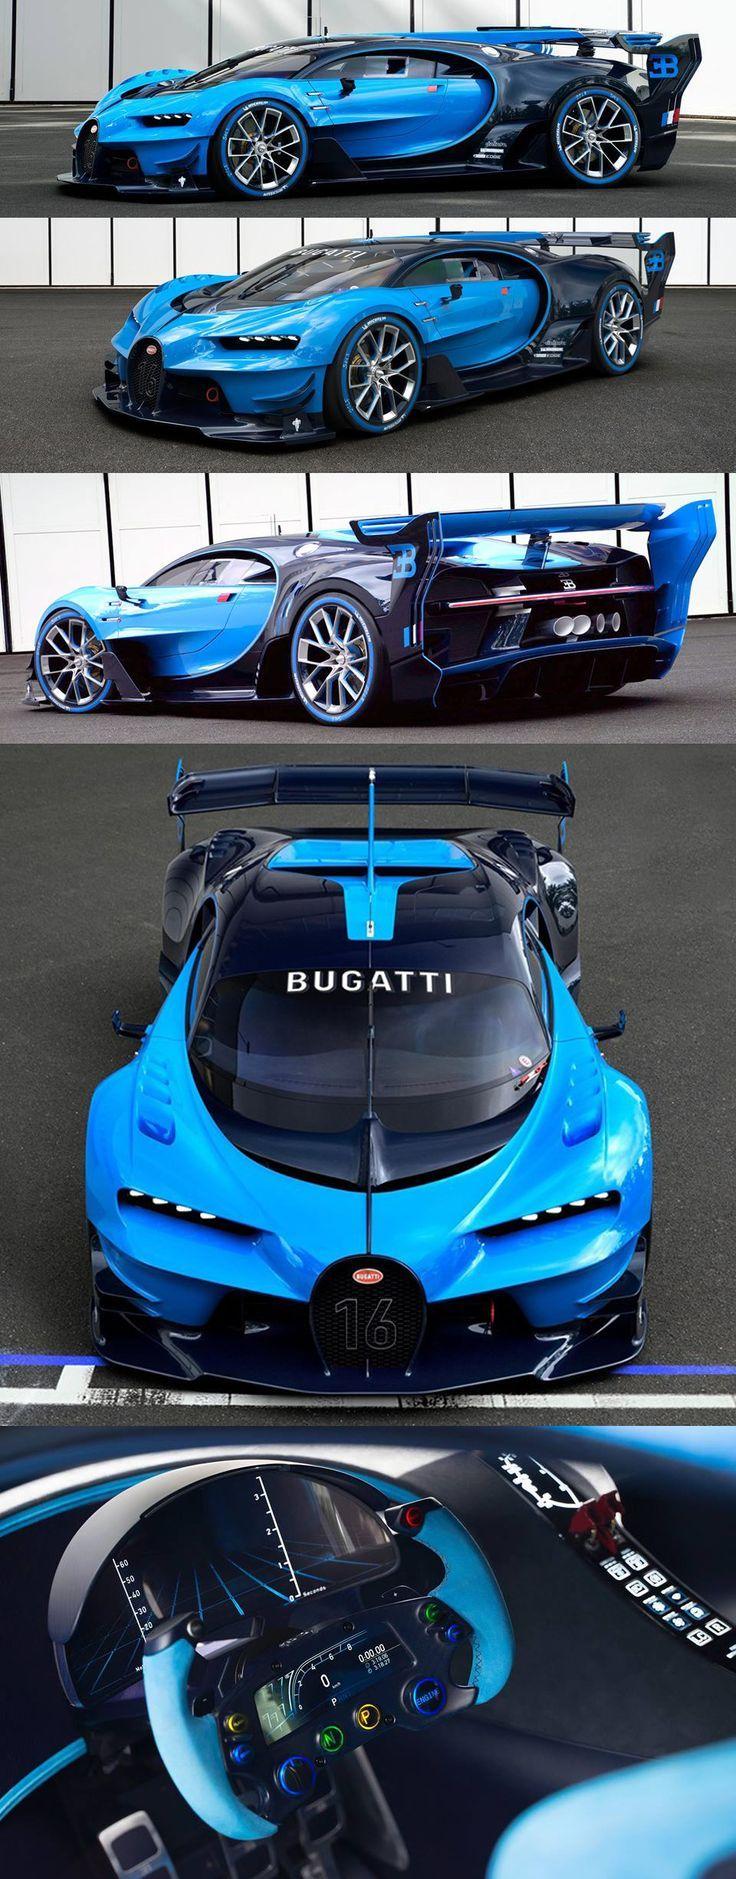 Bugatti Vision Gran Turismo Concept disciplineandinte...                                                                                                                                                                                 Más